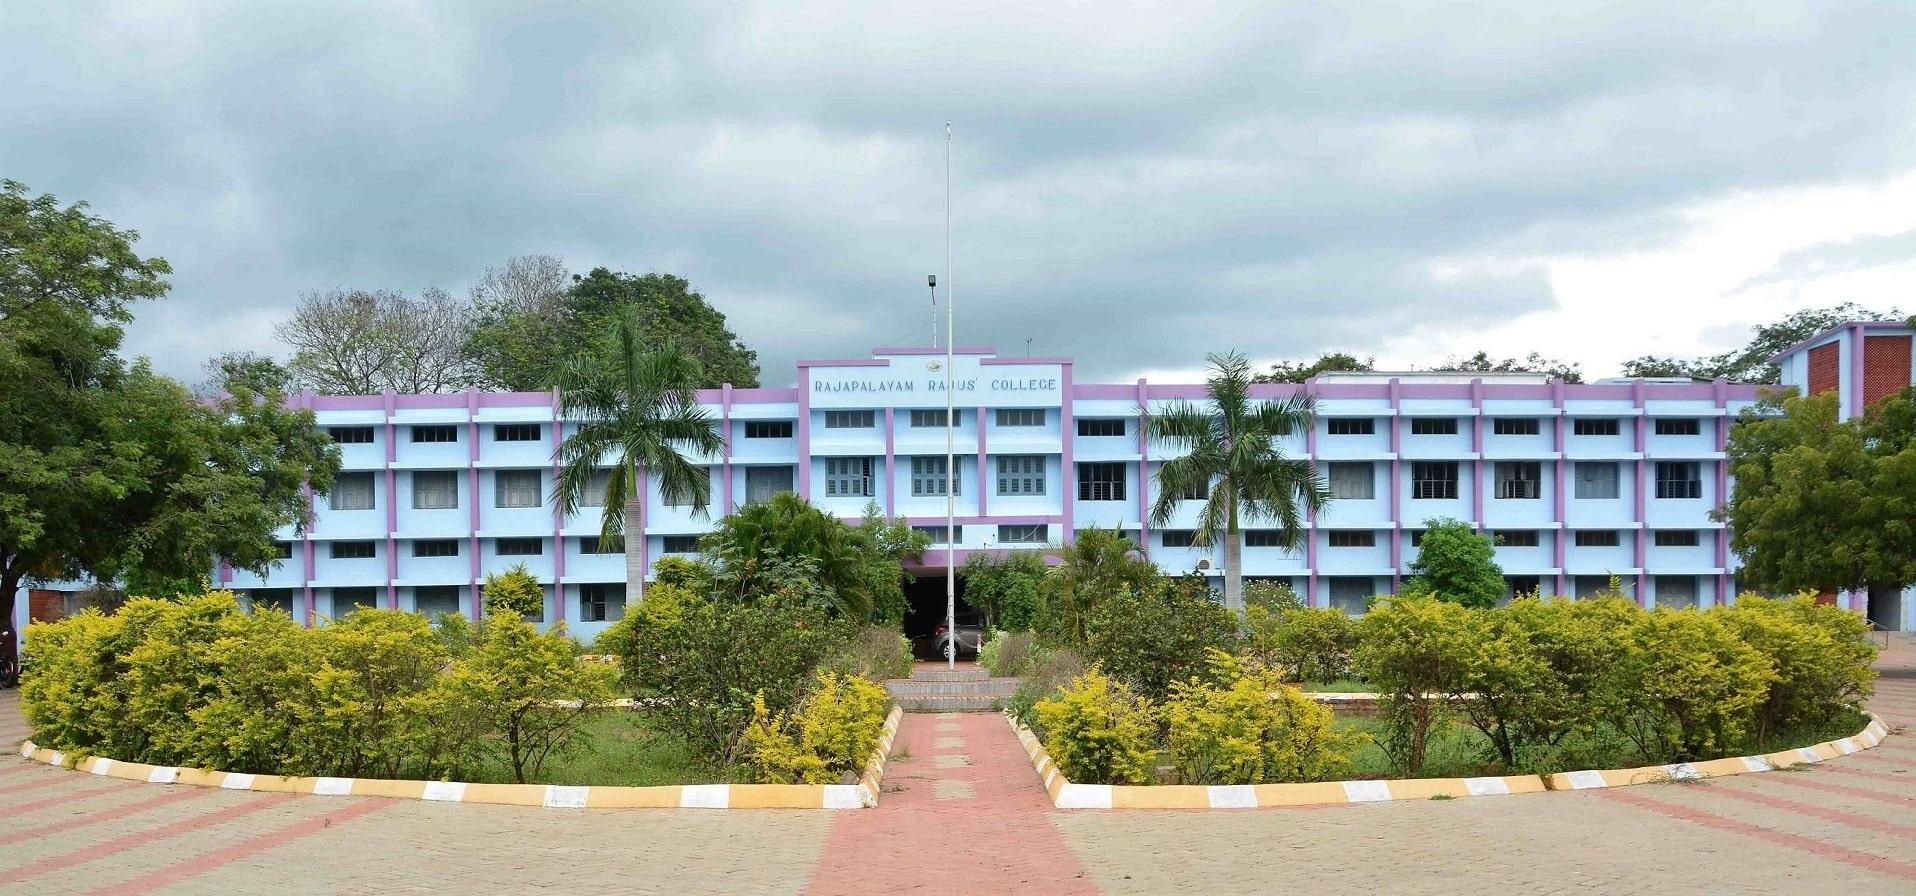 Rajapalayam Rajus' College, Rajapalayam Image